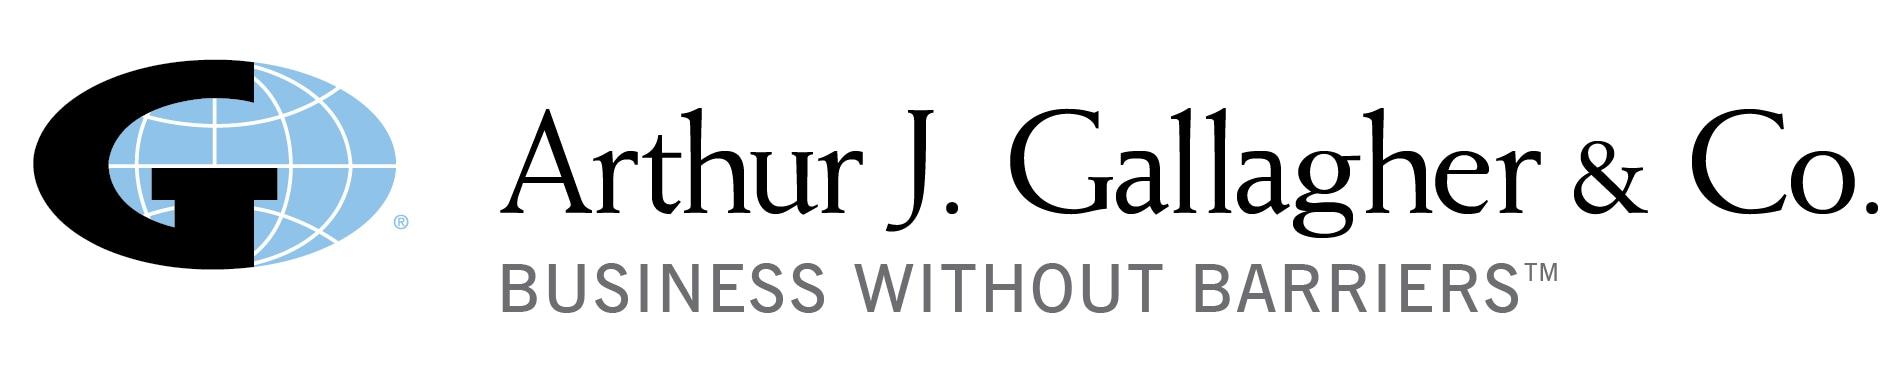 Arthur J. Gallagher & Co